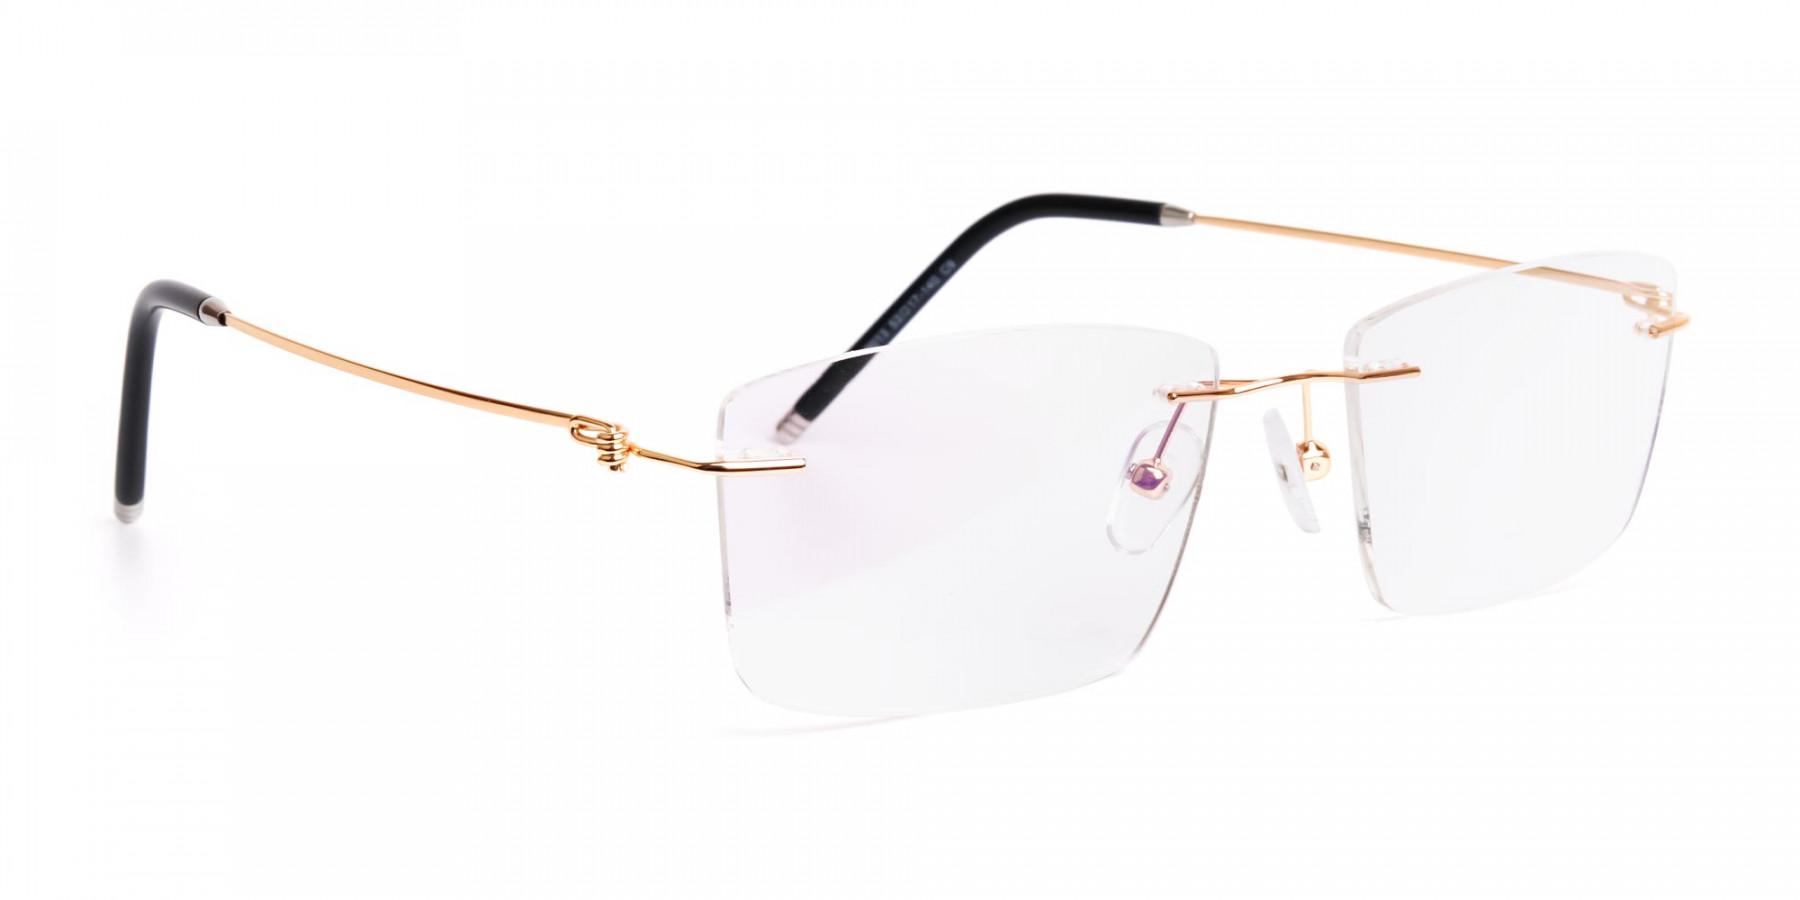 gold-rectangular-rimless-titanium-glasses-frames-1